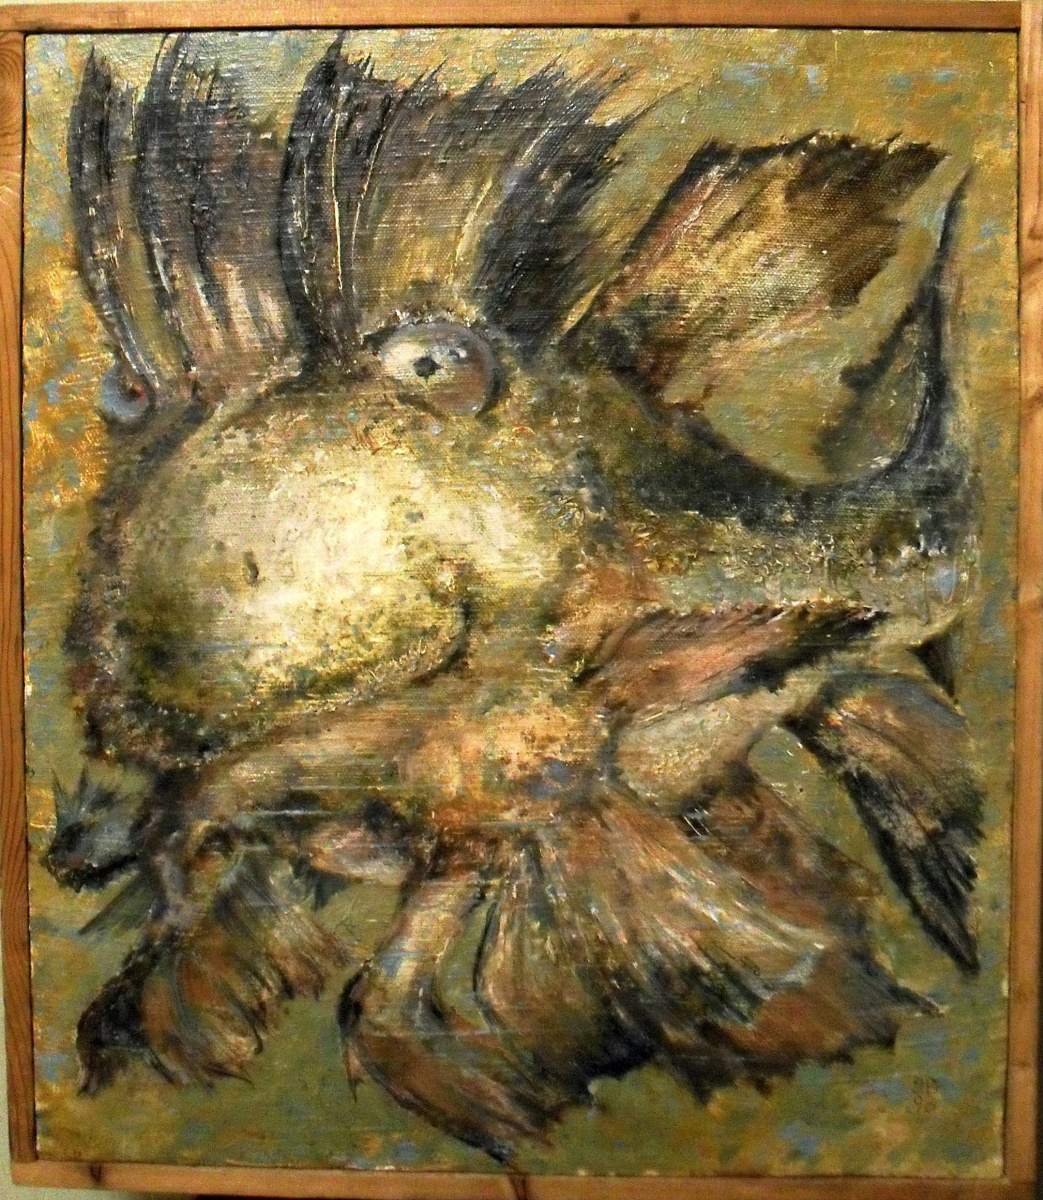 Vadim Vadimovich Novikov. Fish without worries